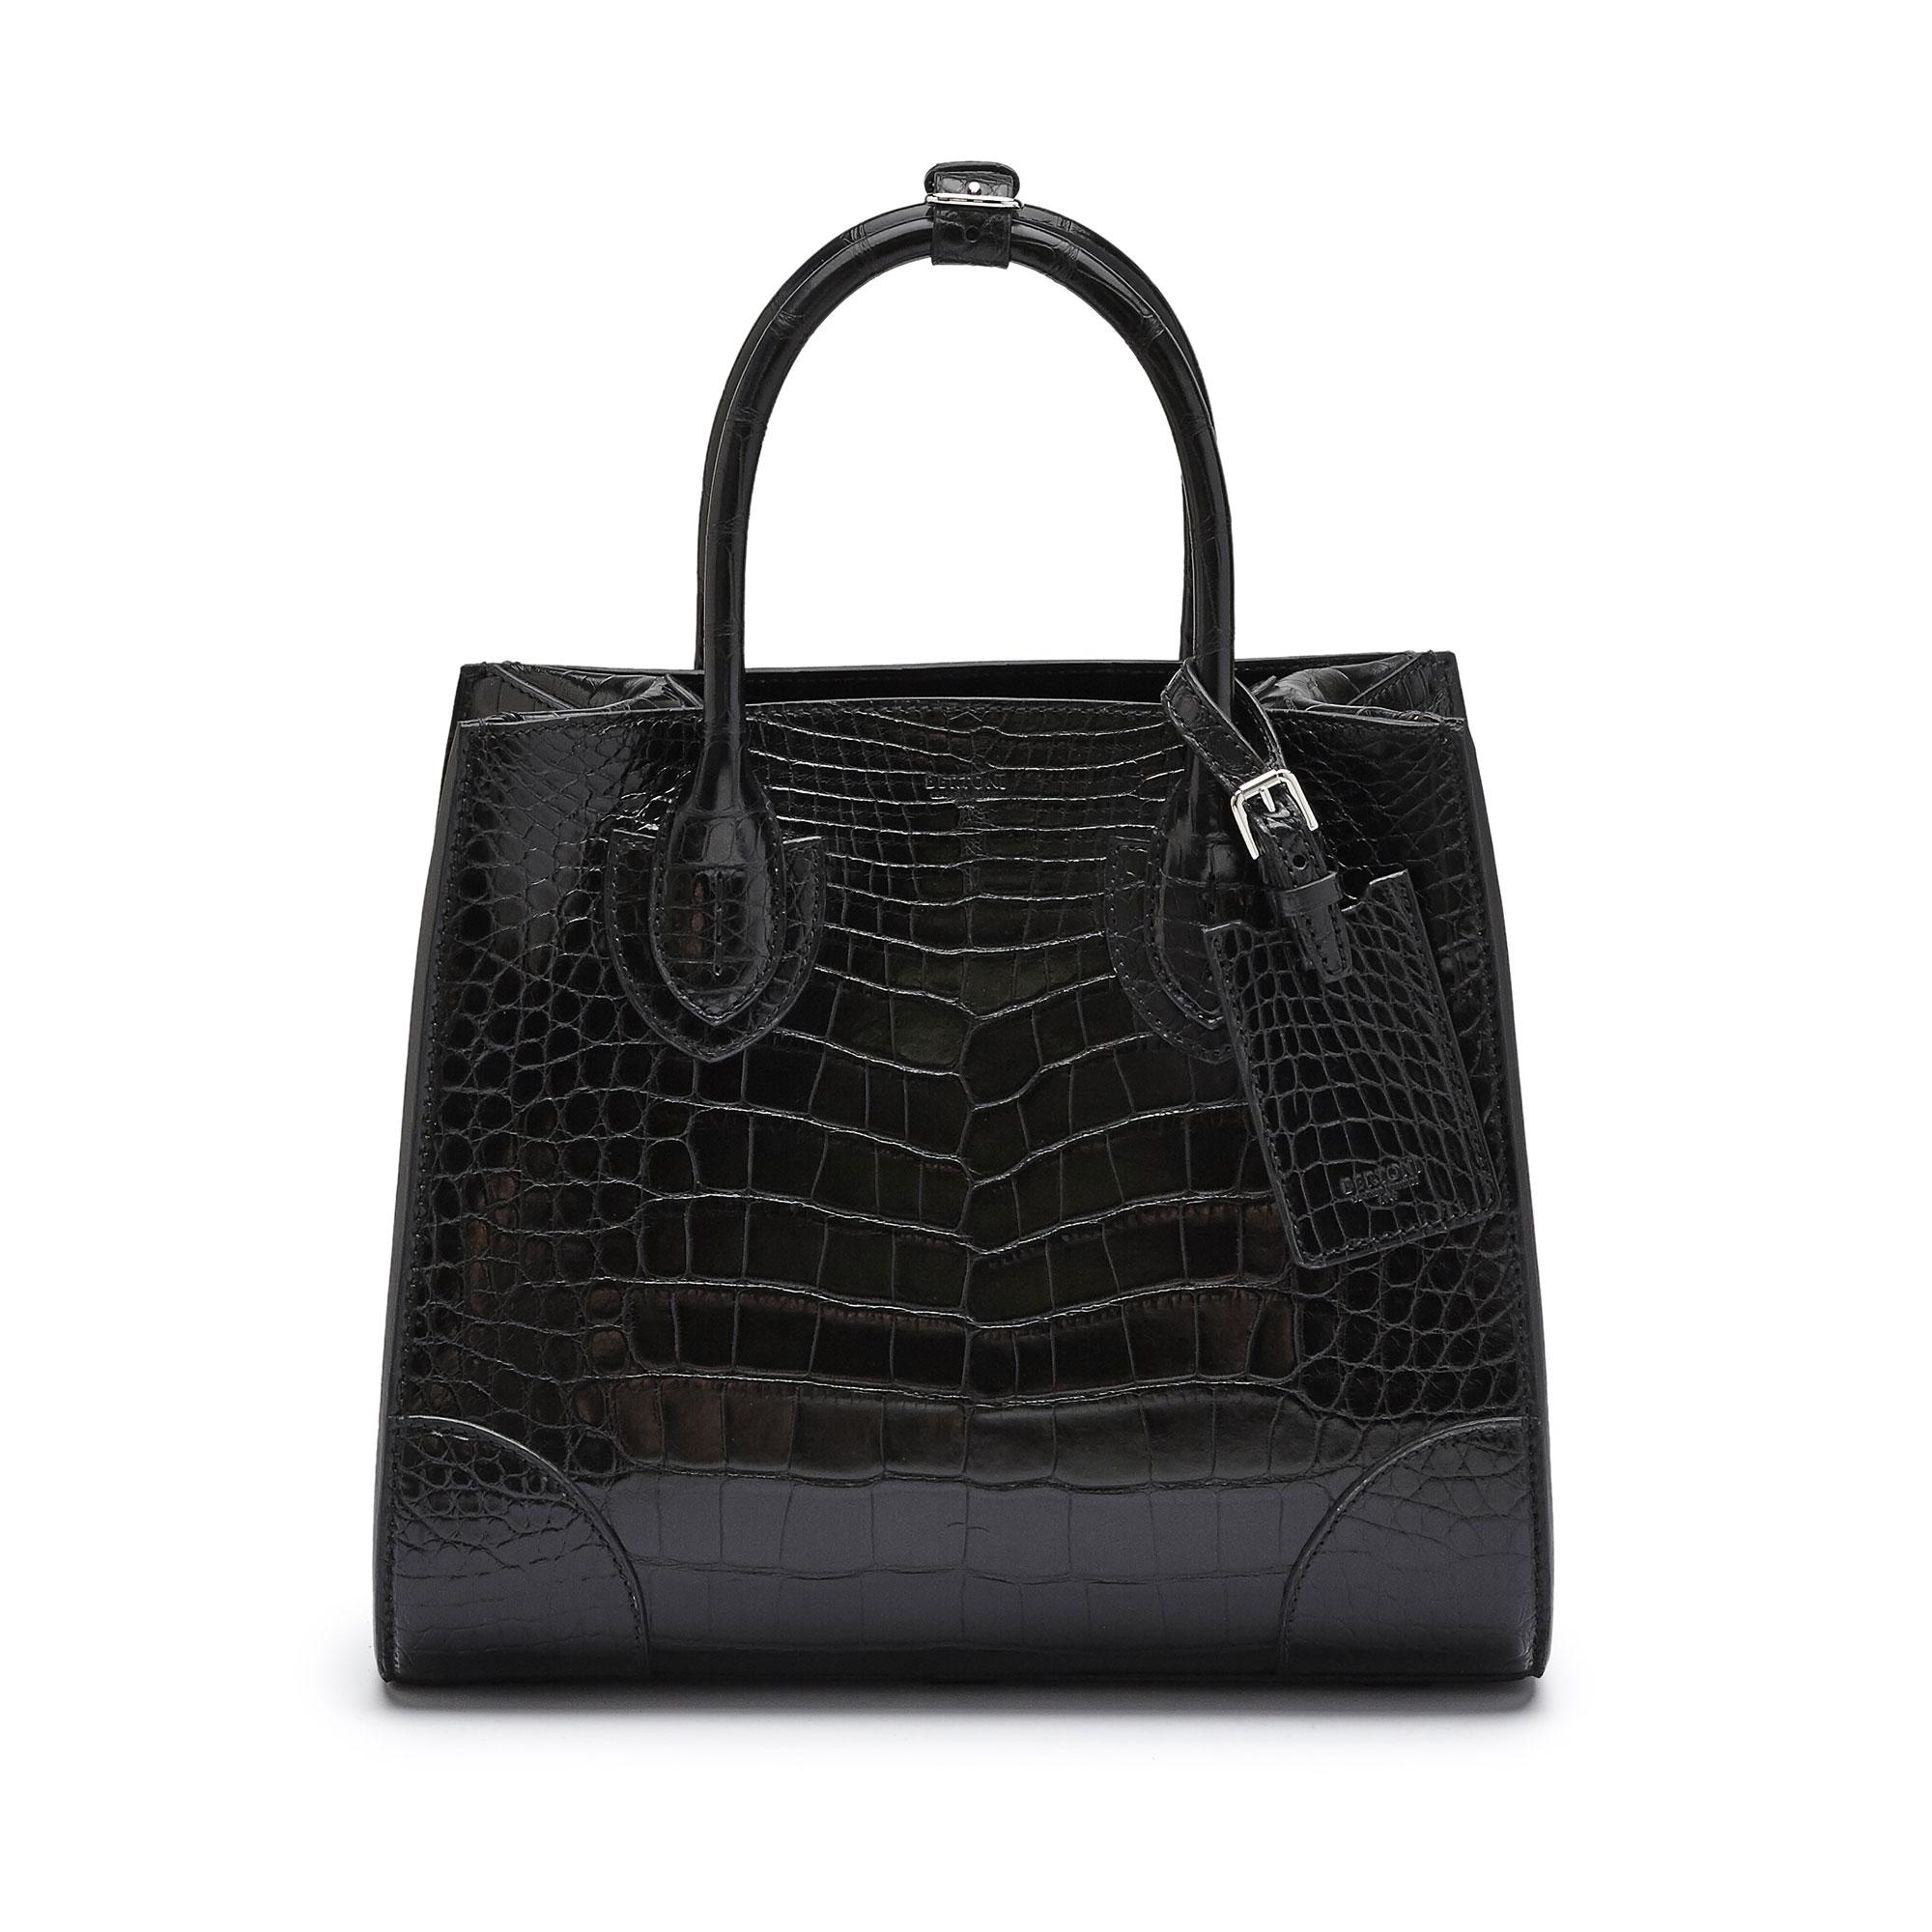 The black alligator Darcy medium bag by Bertoni 1949 02